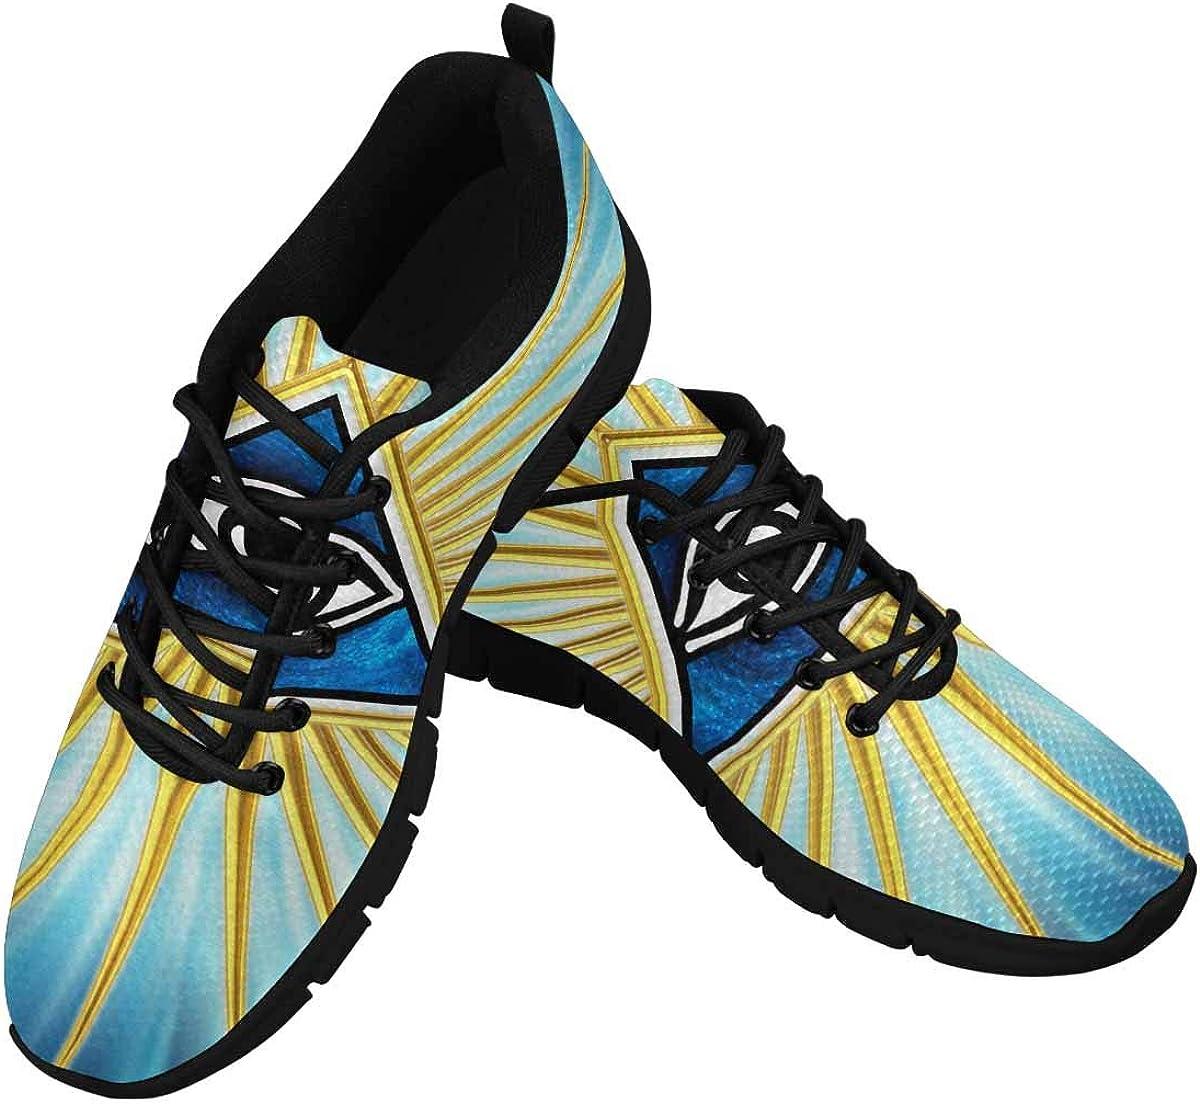 INTERESTPRINT Eye of Providence Women's Tennis Running Shoes Lightweight Sneakers